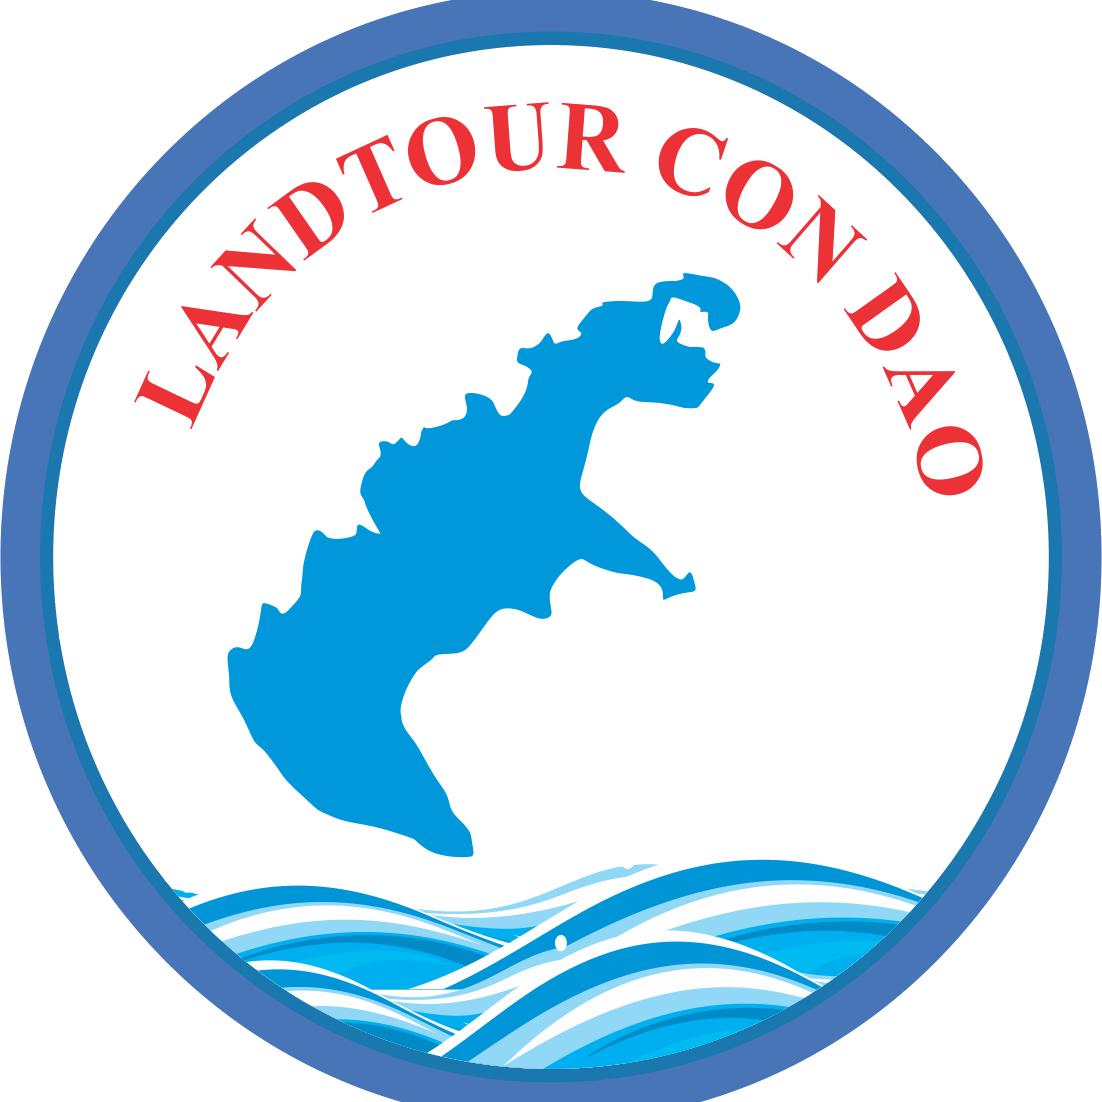 Landtour Côn Đảo